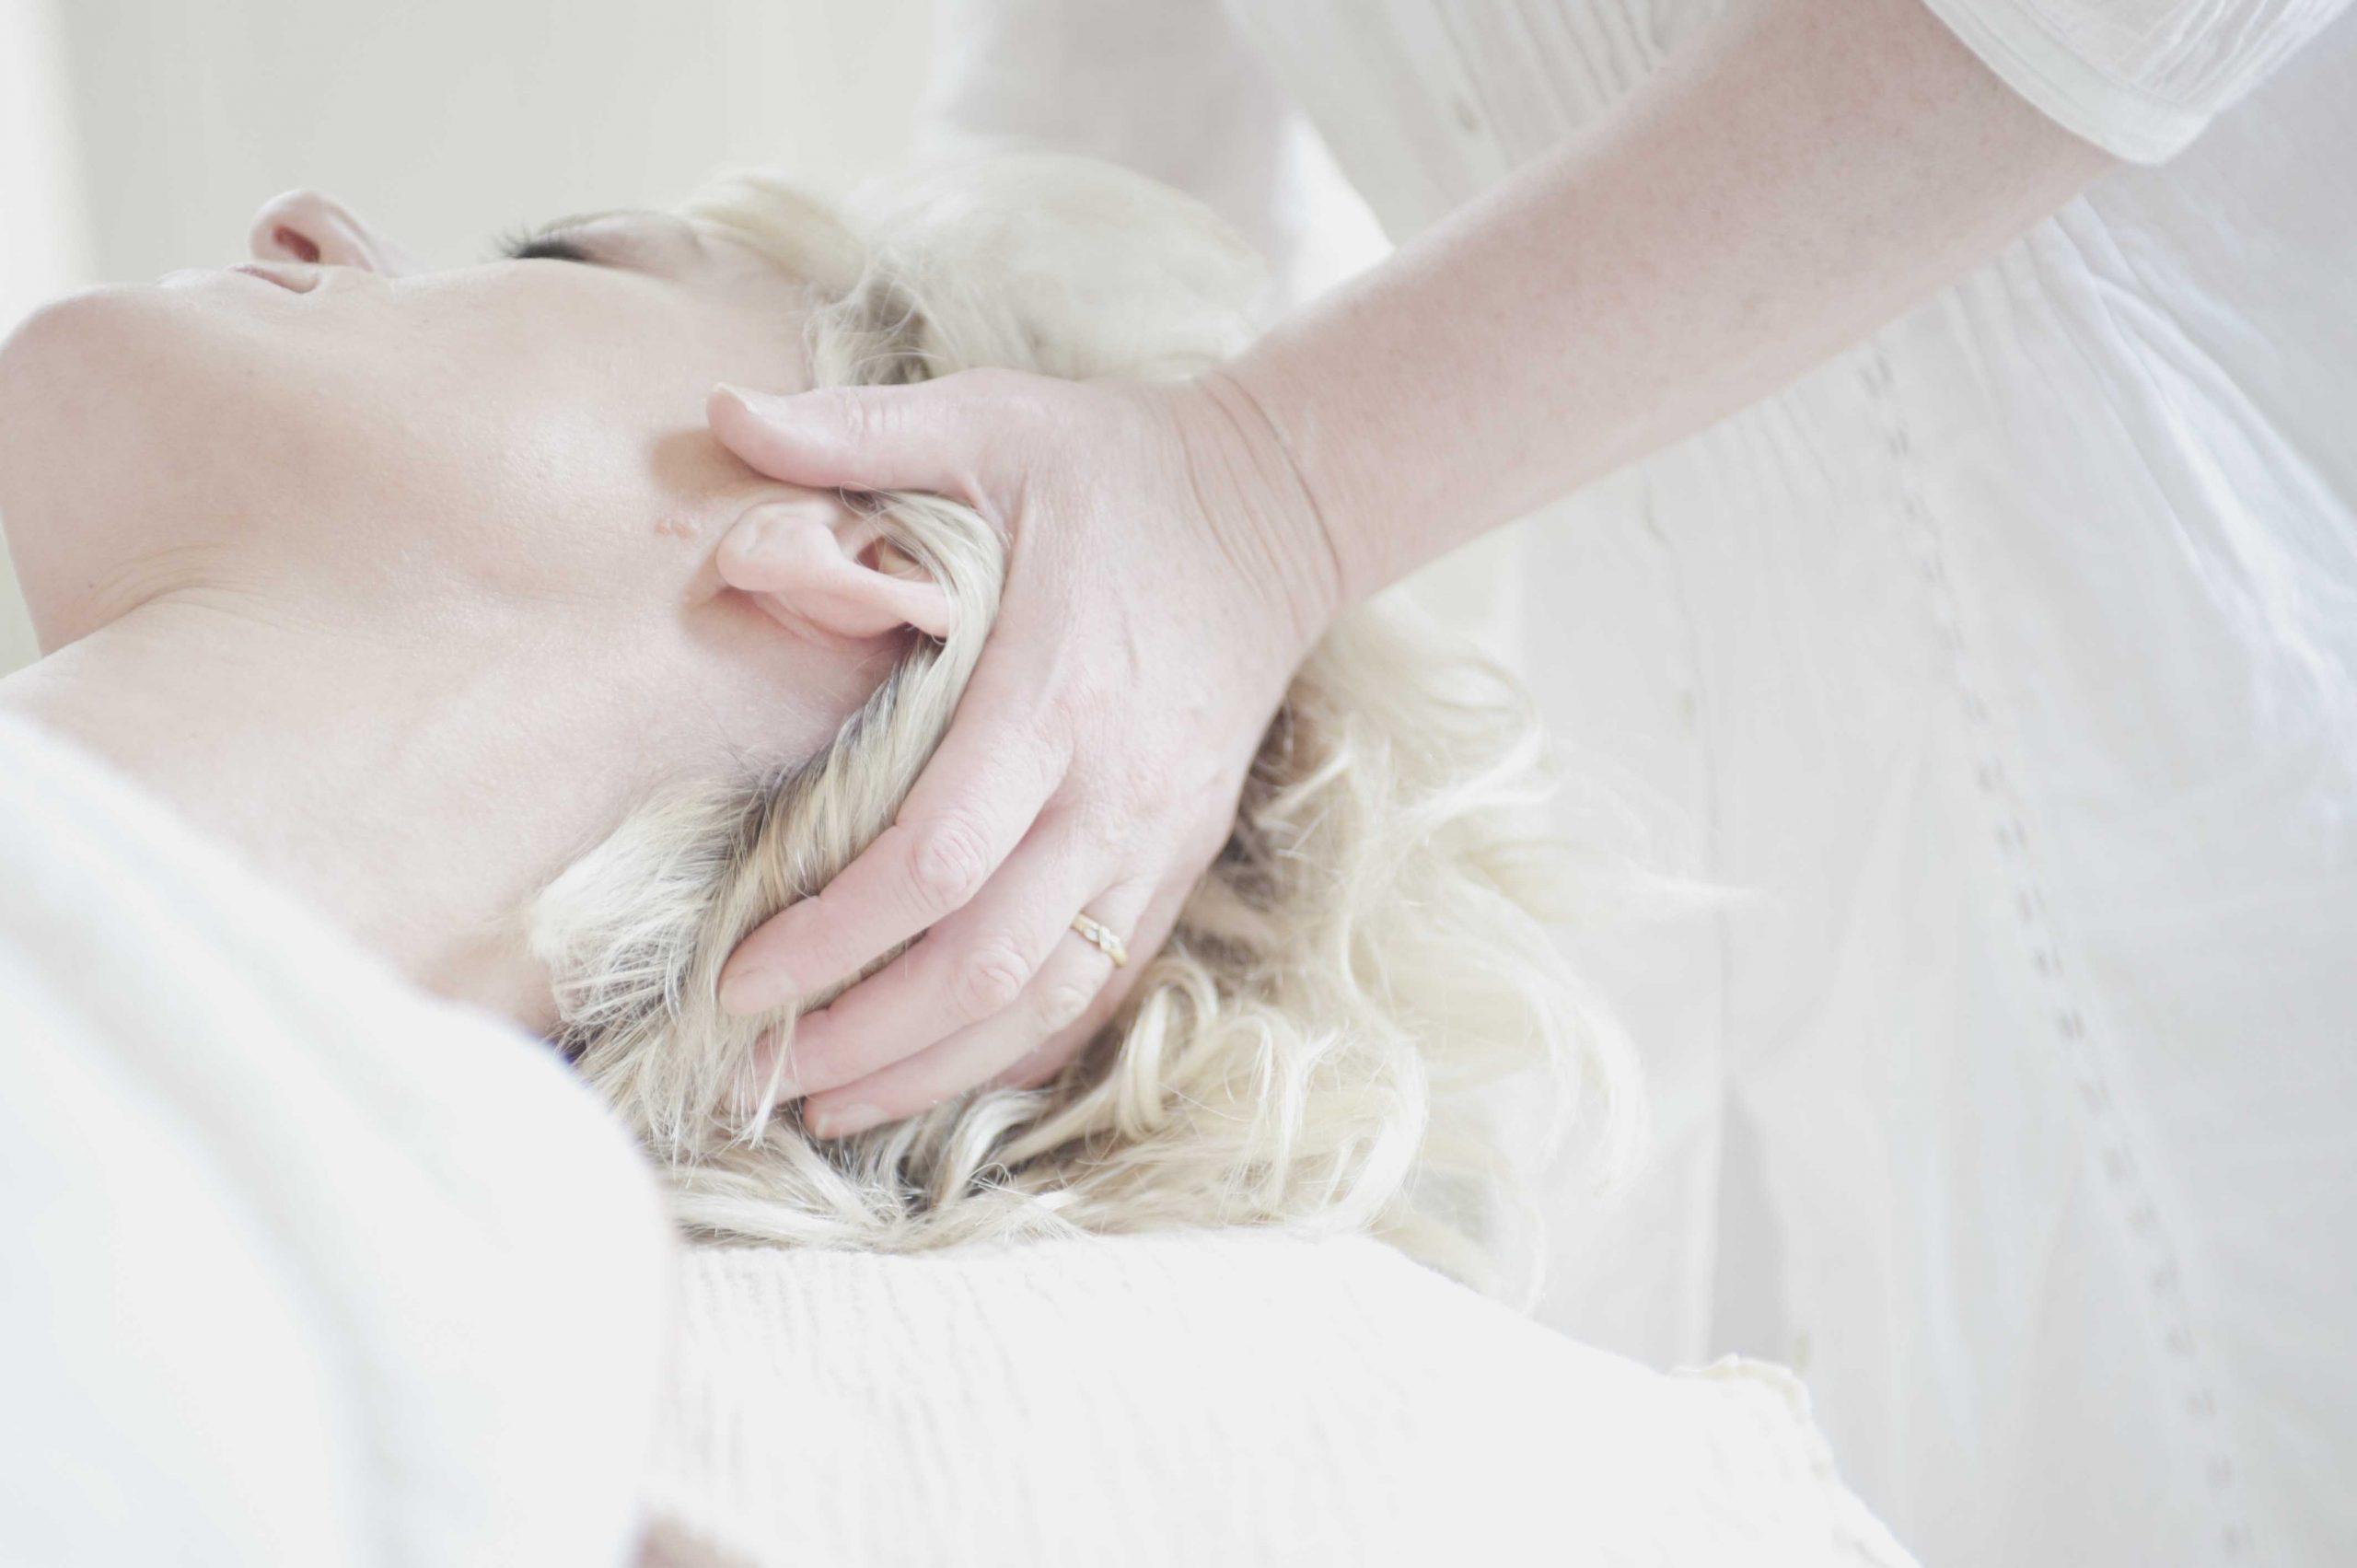 masaje-terapéutico-astigarraga-maribi-barrocal-cuello